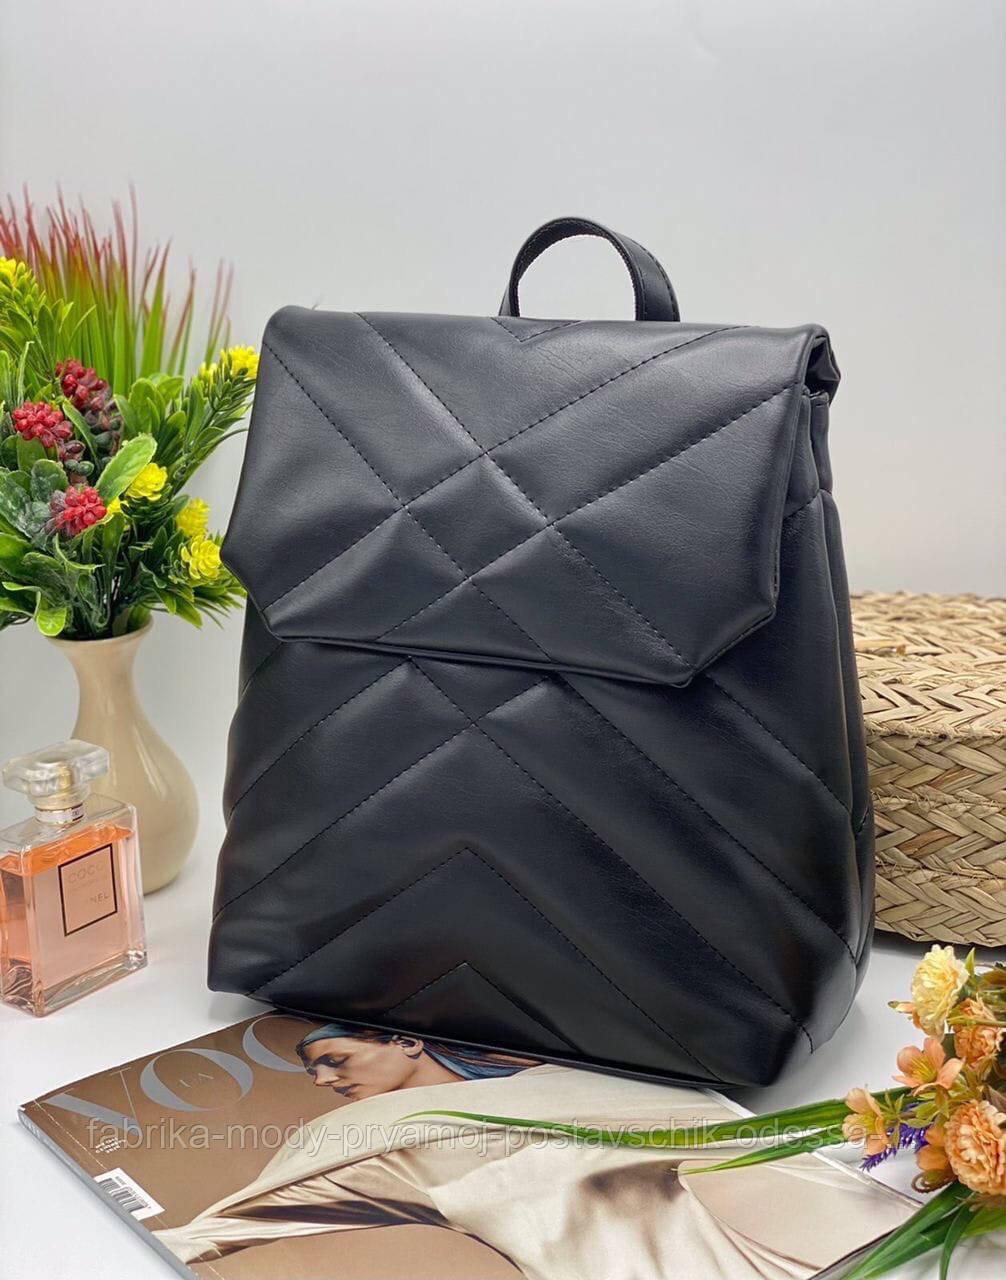 Рюкзак Модель - R028 Фото реал